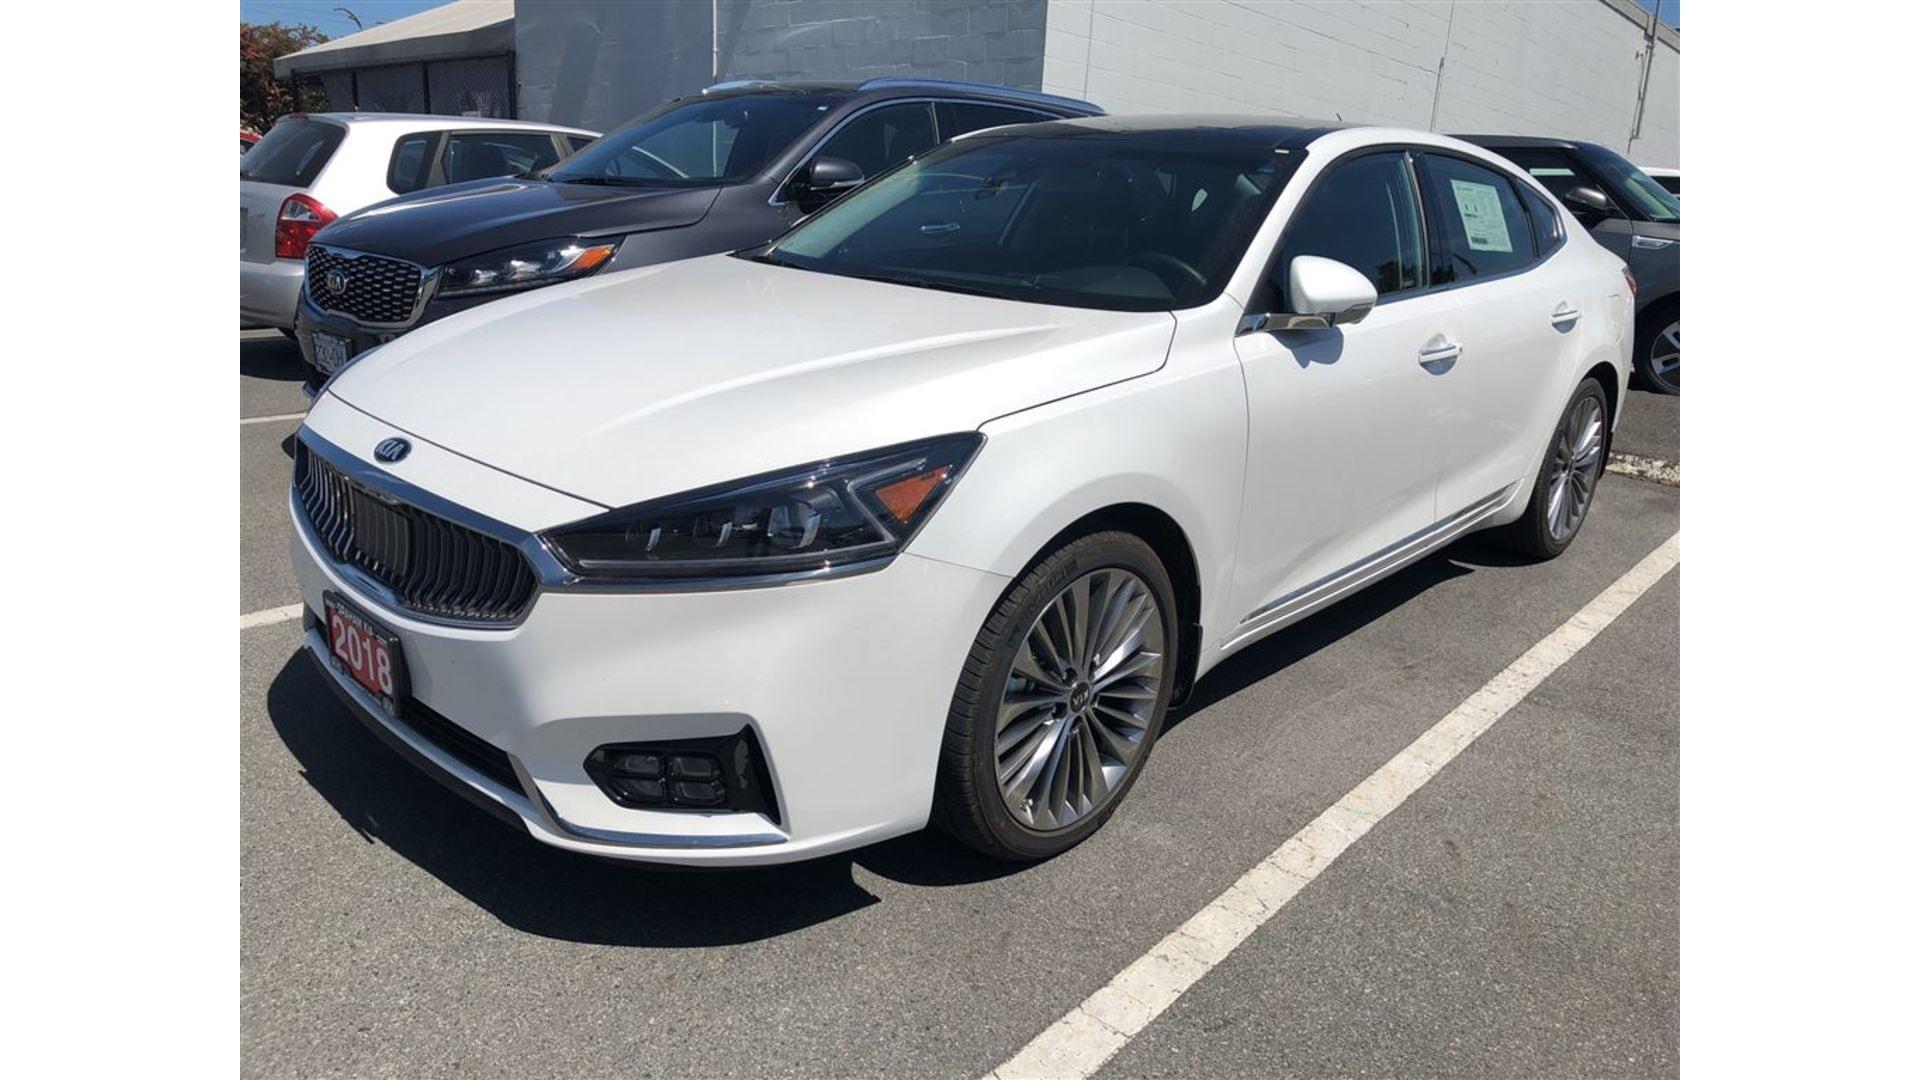 2018 Kia Cadenza Limited, DEMO 4000KMS/PRICE REDUCED $8000